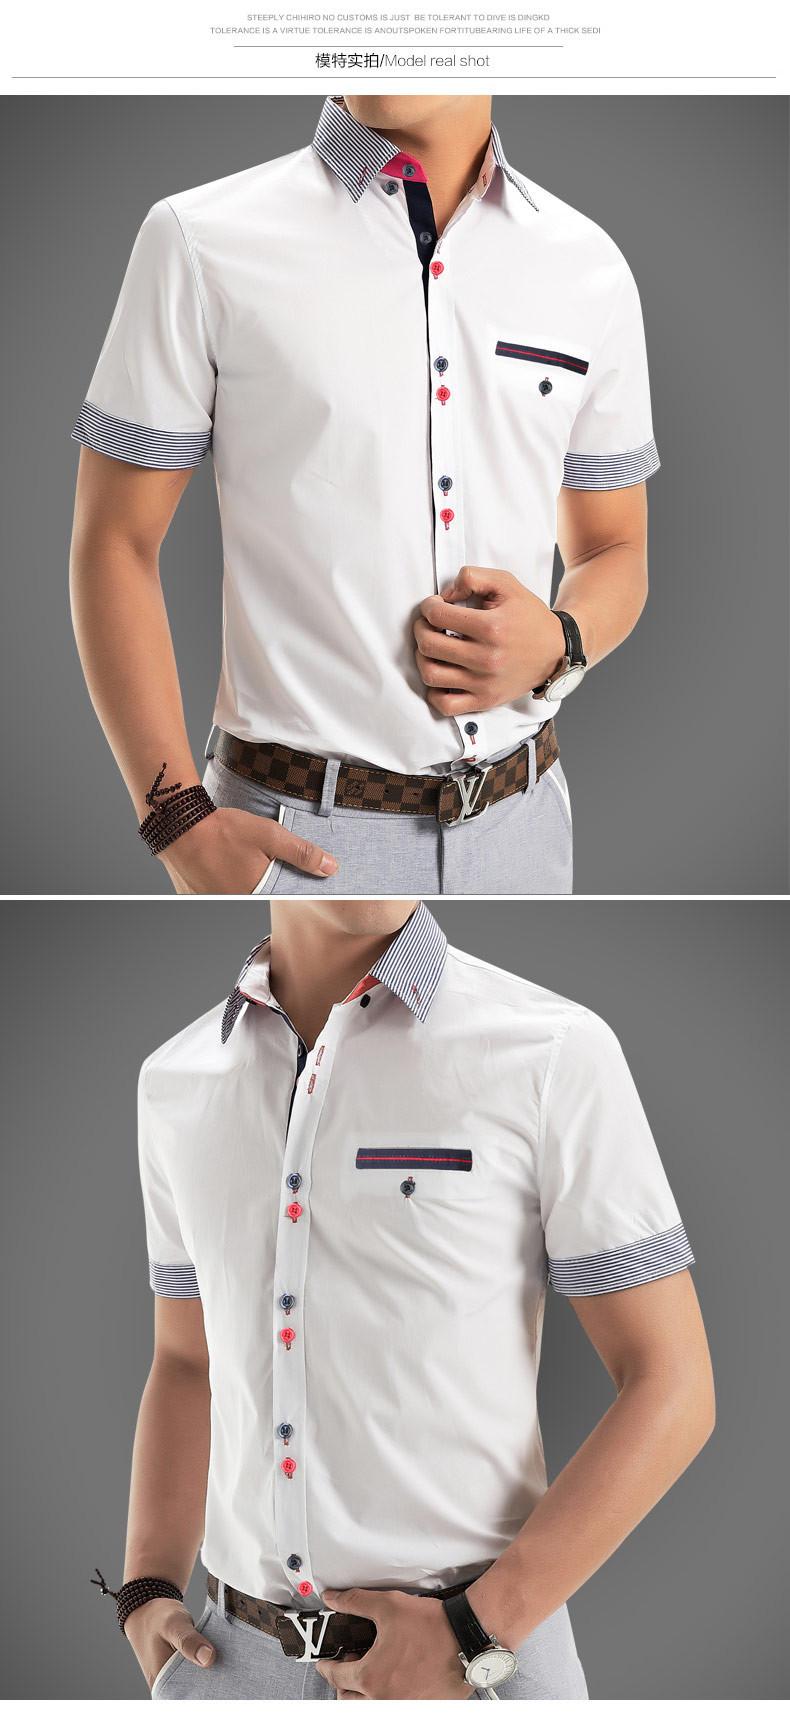 2015 Men Shirt New Brand Shirts Short Sleeve Casual Shirt Men Slim Fit Brand Design Formal Shirt Camisa Social Chemise Homme2